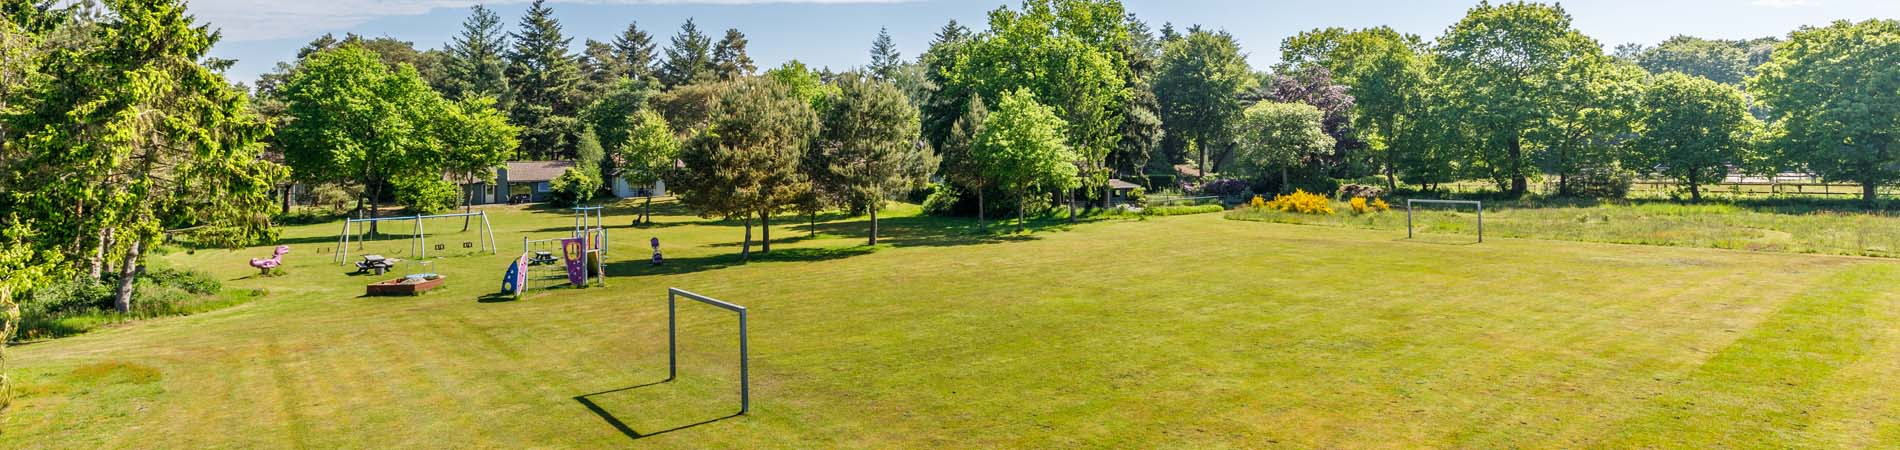 Bungalowpark-Veluwe-speeltuin